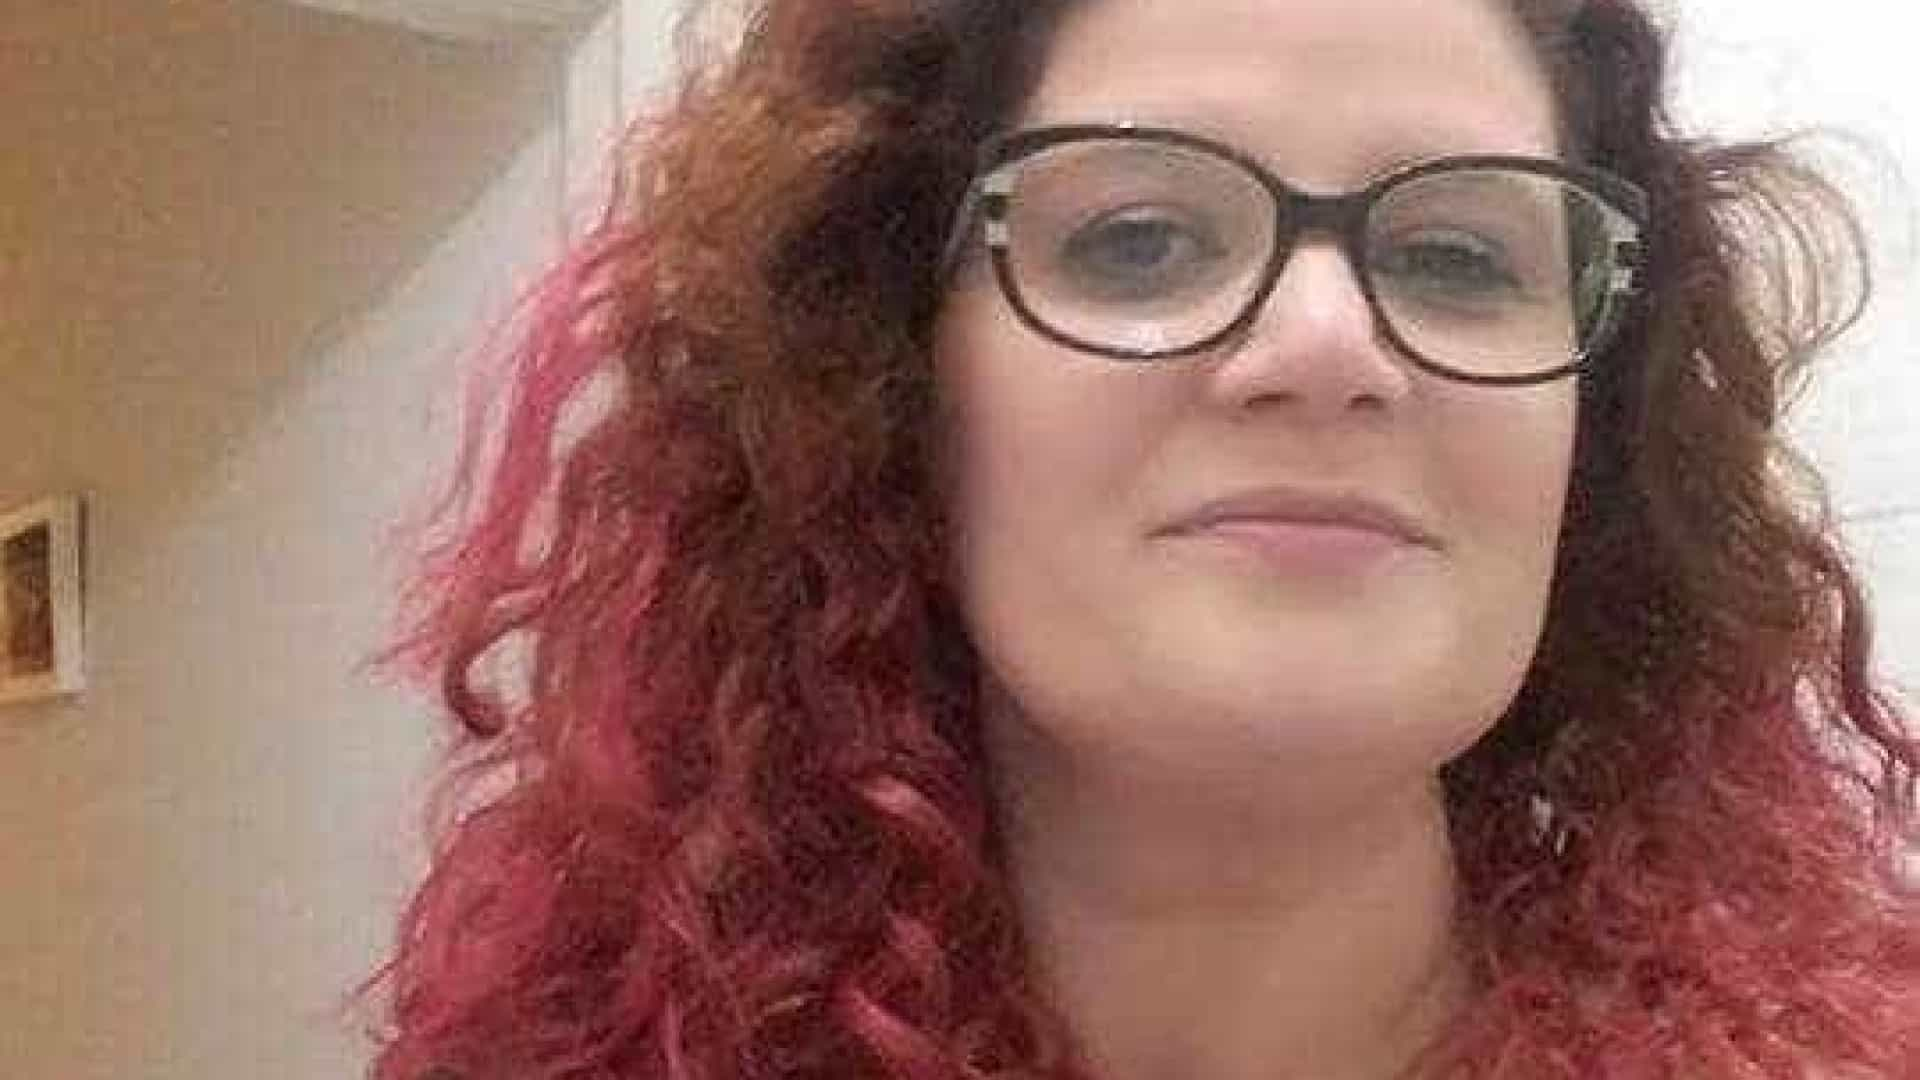 Diretora da Emia, Luciana Schwinden, pede para ser afastada do cargo